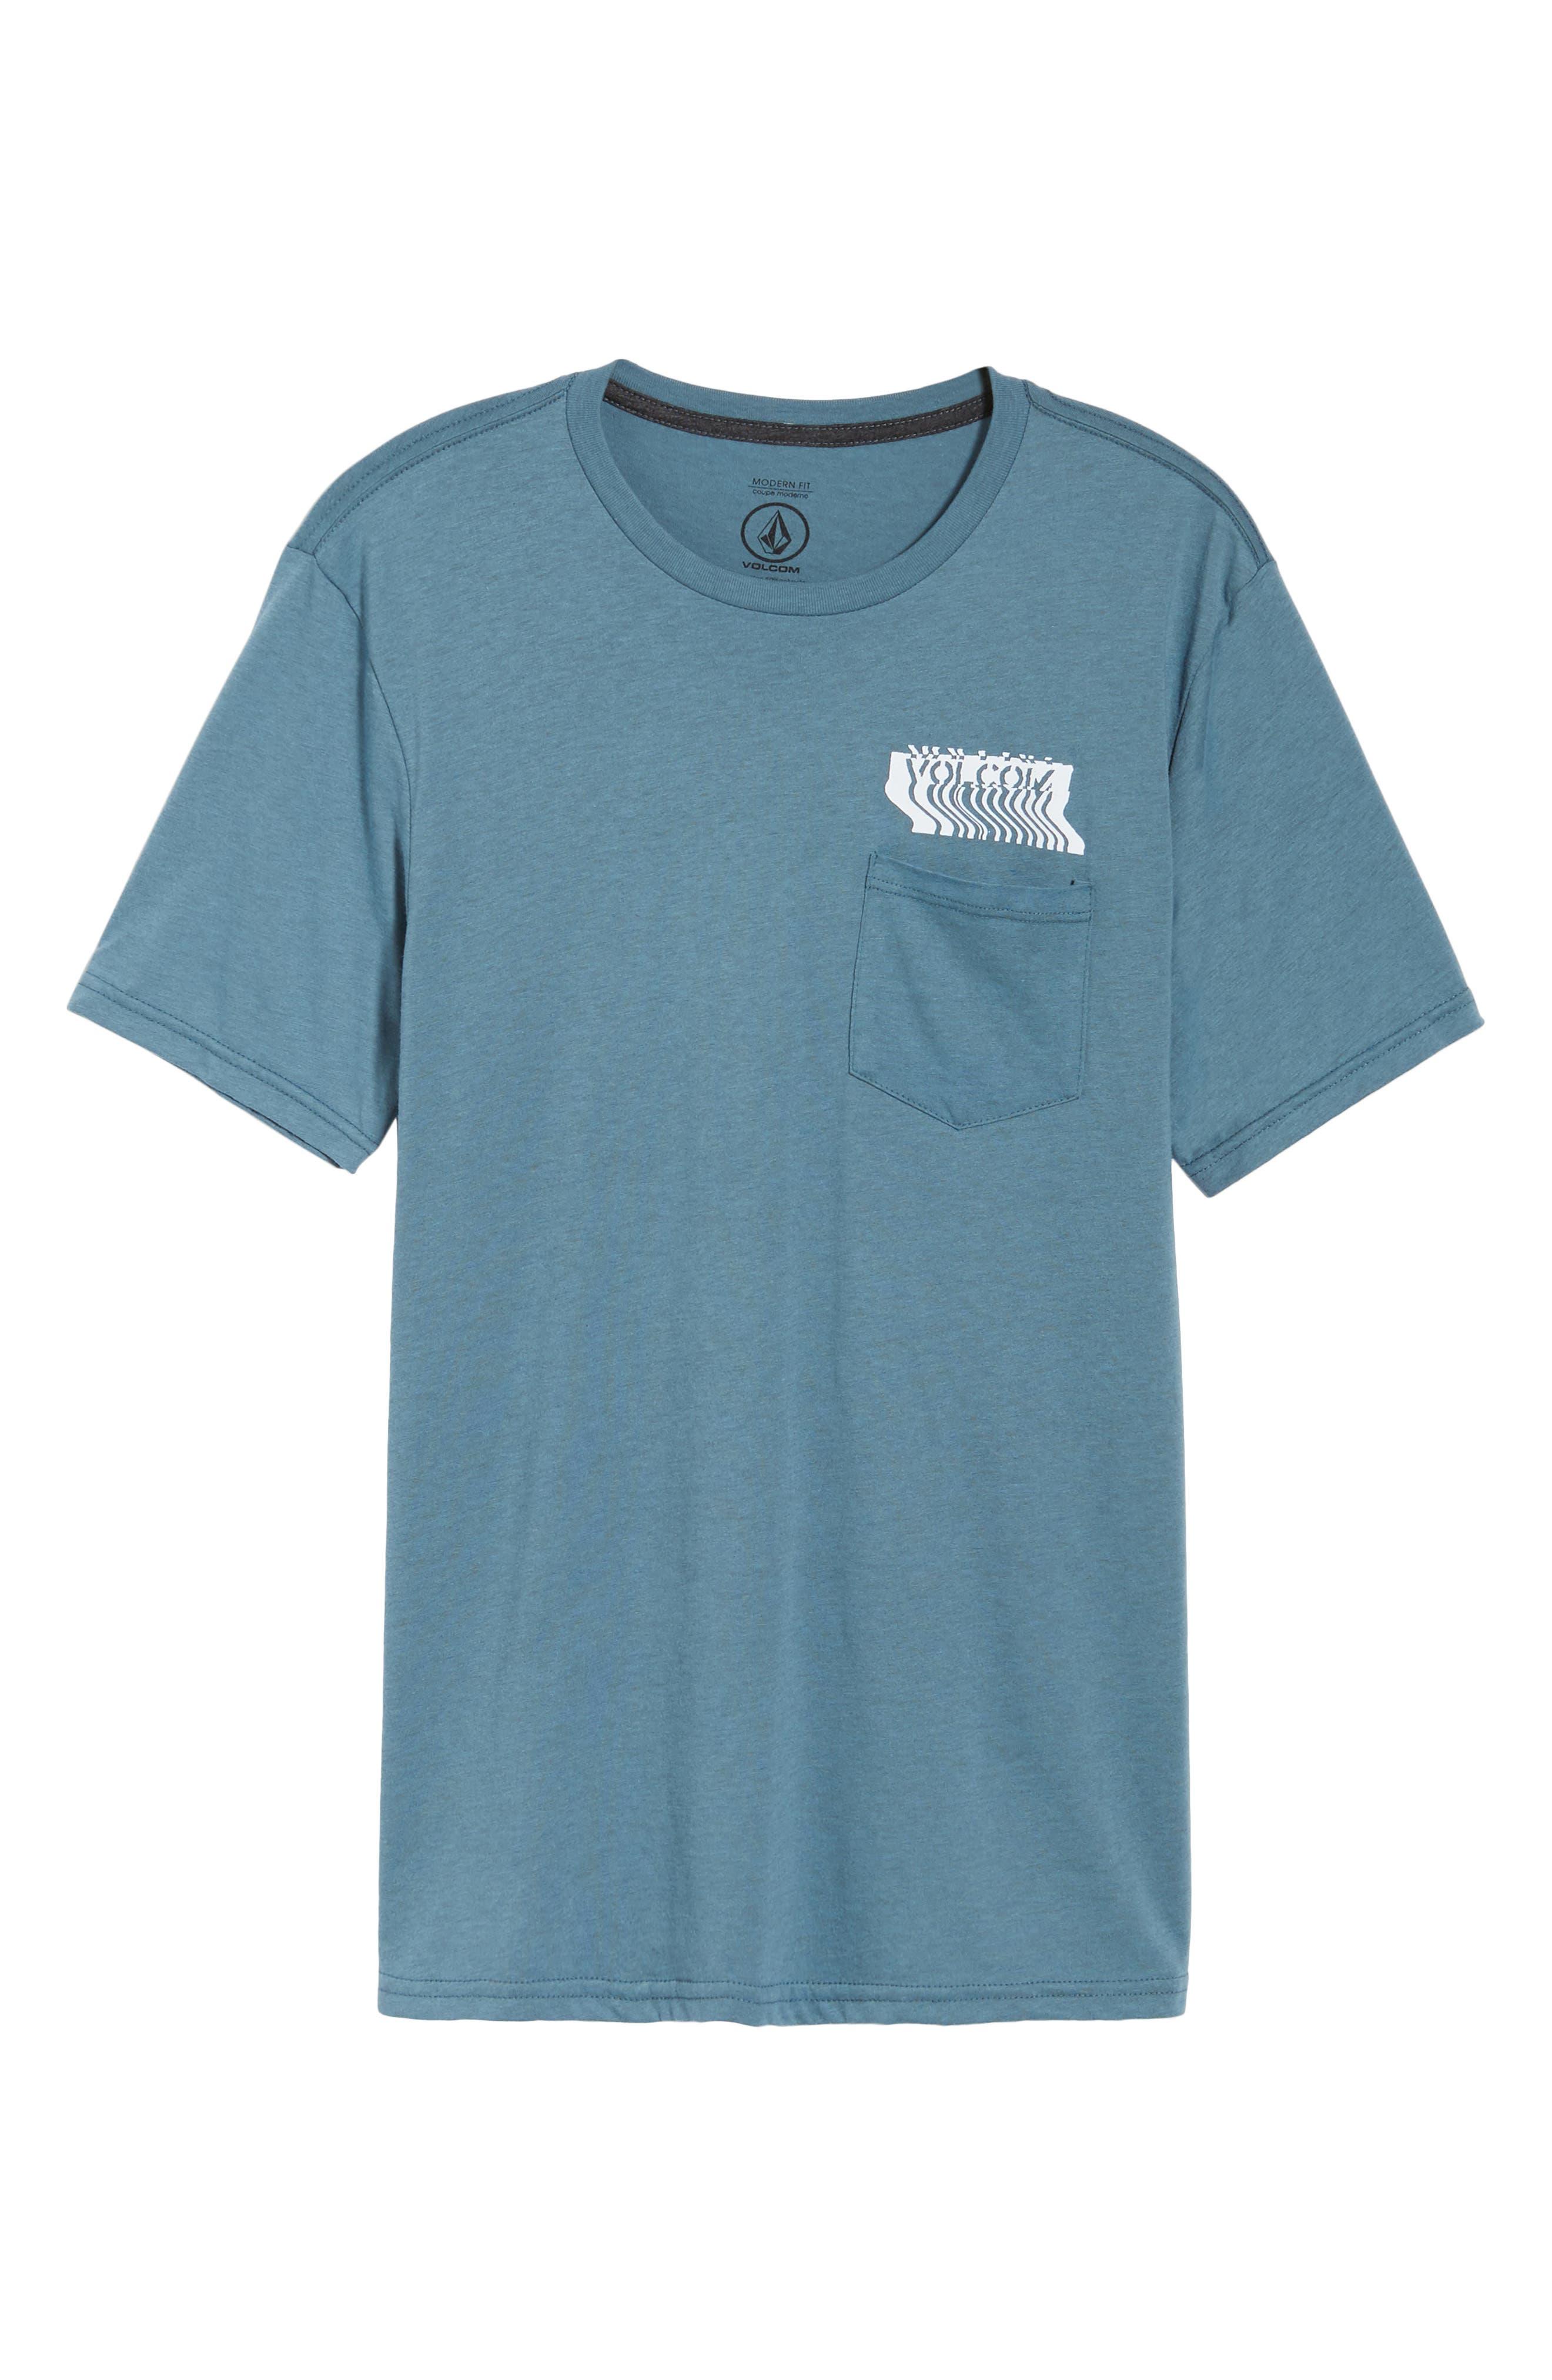 Bard Pocket Cotton Blend T-Shirt,                             Alternate thumbnail 6, color,                             Indigo